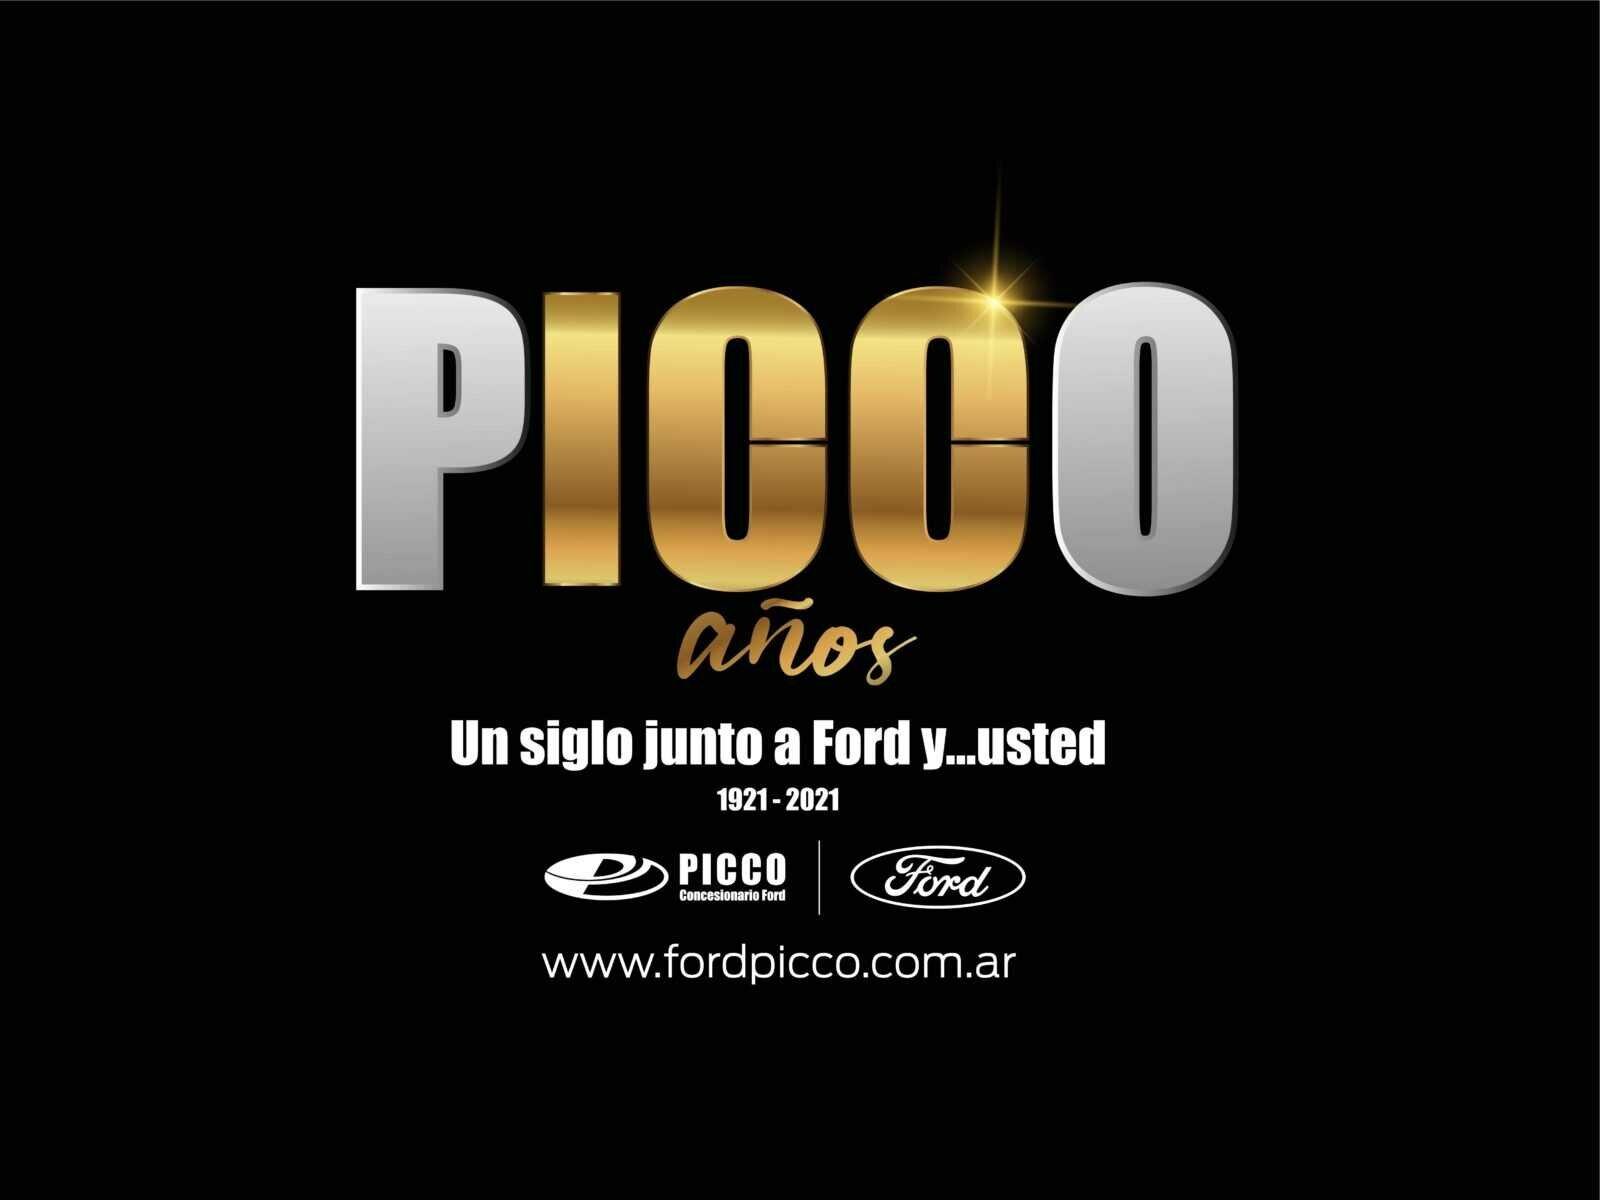 Ford Picco 100 años